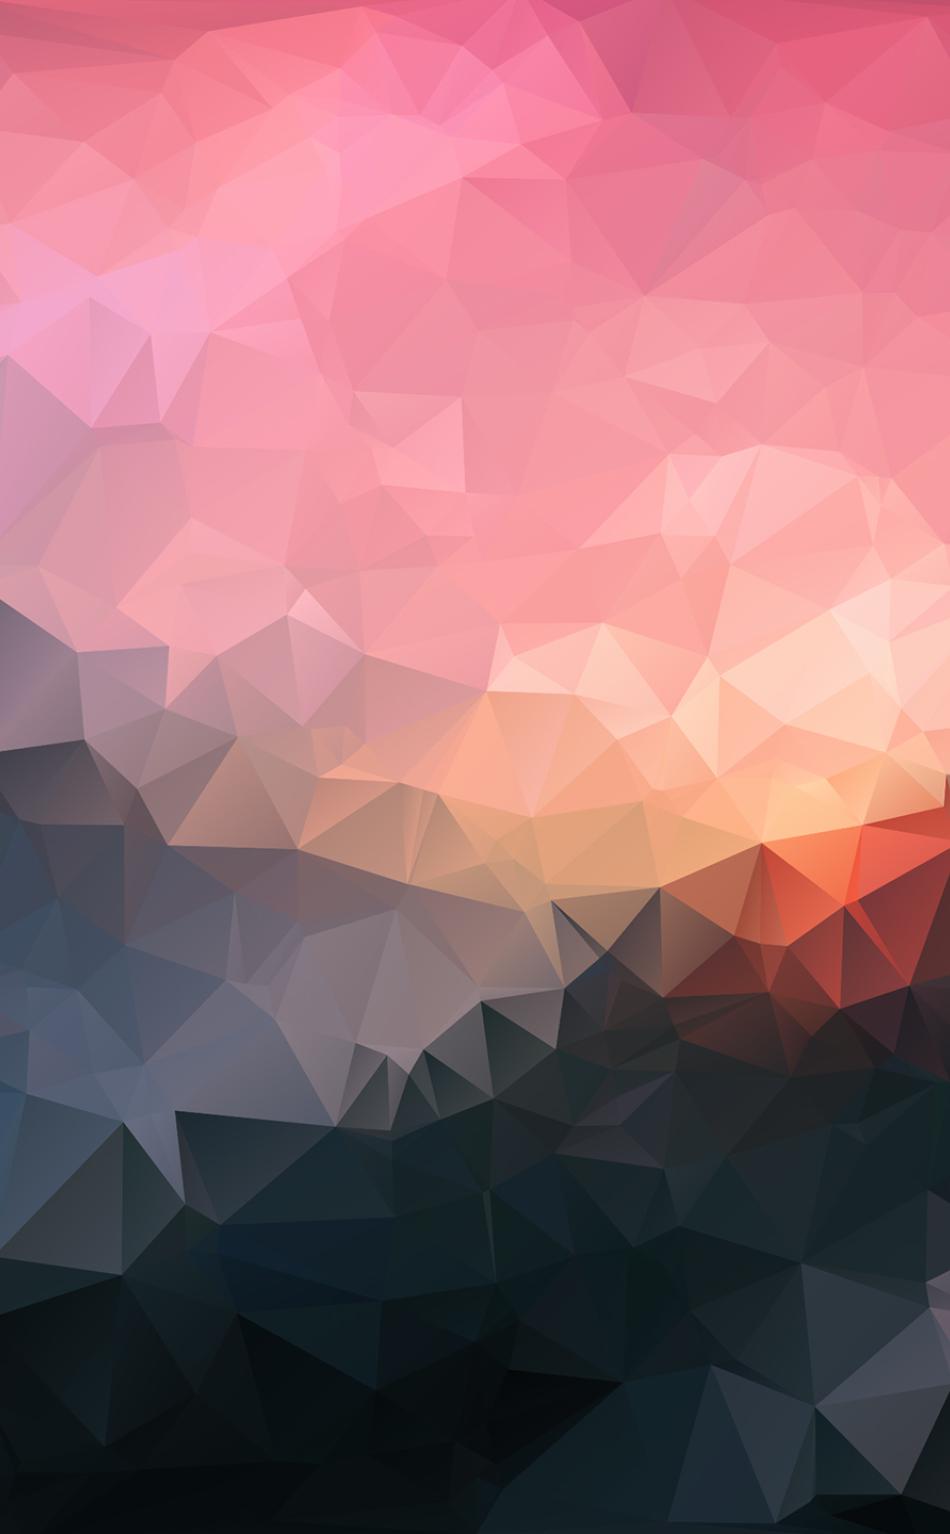 Must see Wallpaper Mountain Polygon - polygon-mountains_62088_950x1534  Pic_877796.jpg